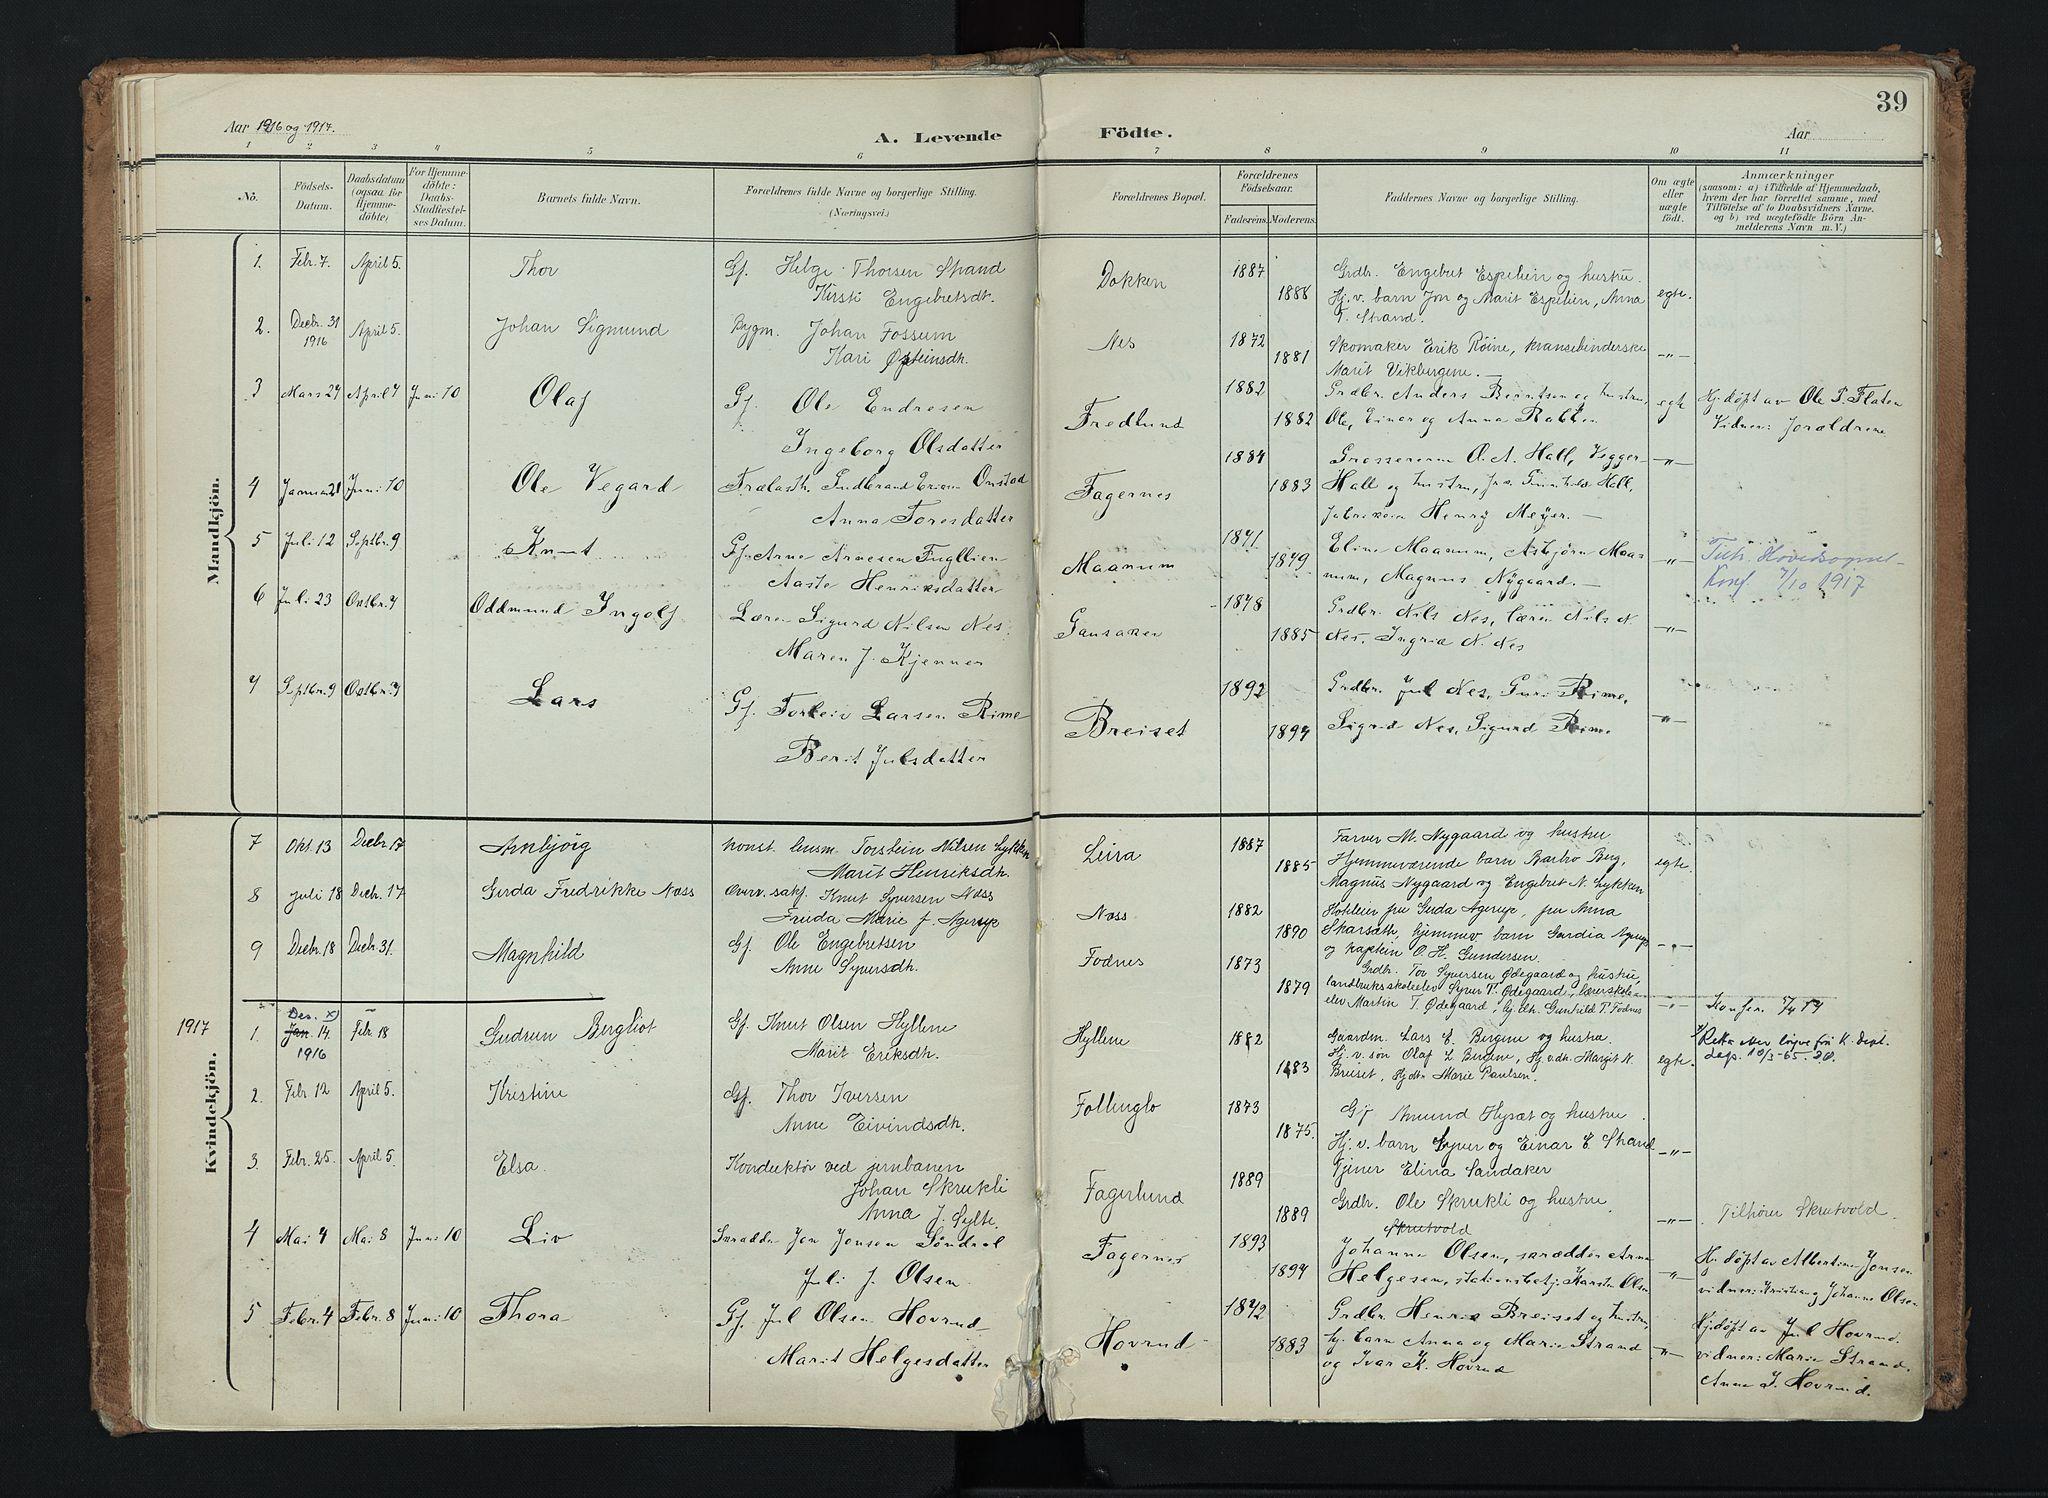 SAH, Nord-Aurdal prestekontor, Ministerialbok nr. 16, 1897-1925, s. 39